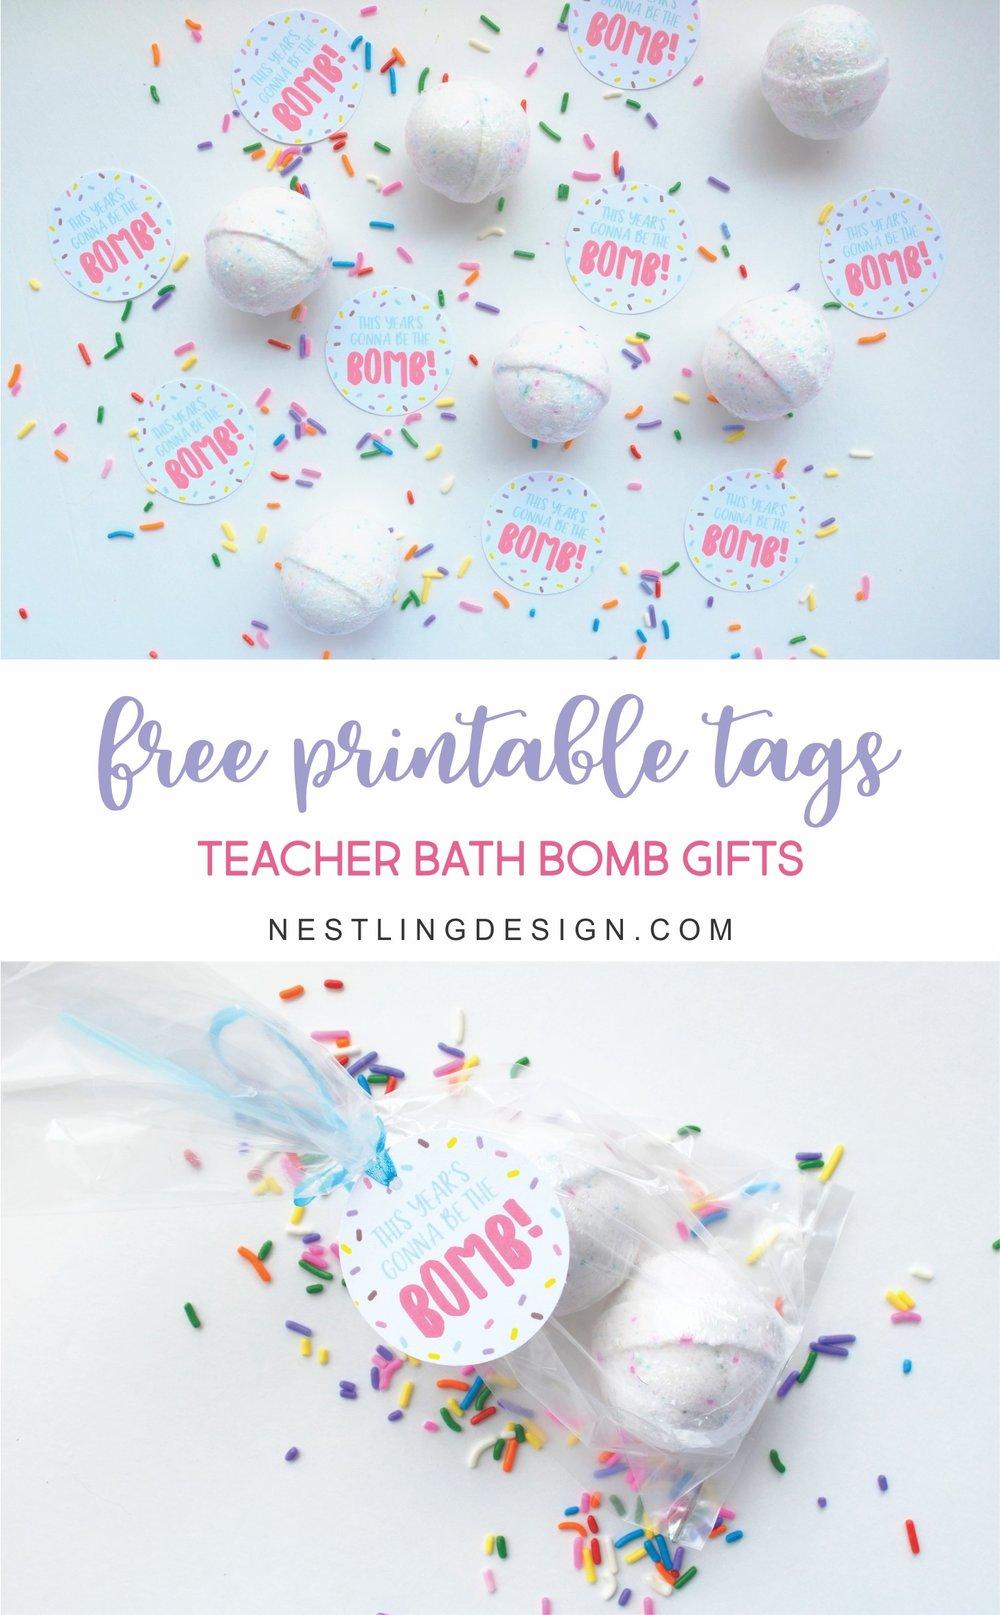 Free Printable Teacher Bath Bomb Gift Tags | NestlingDesign.com